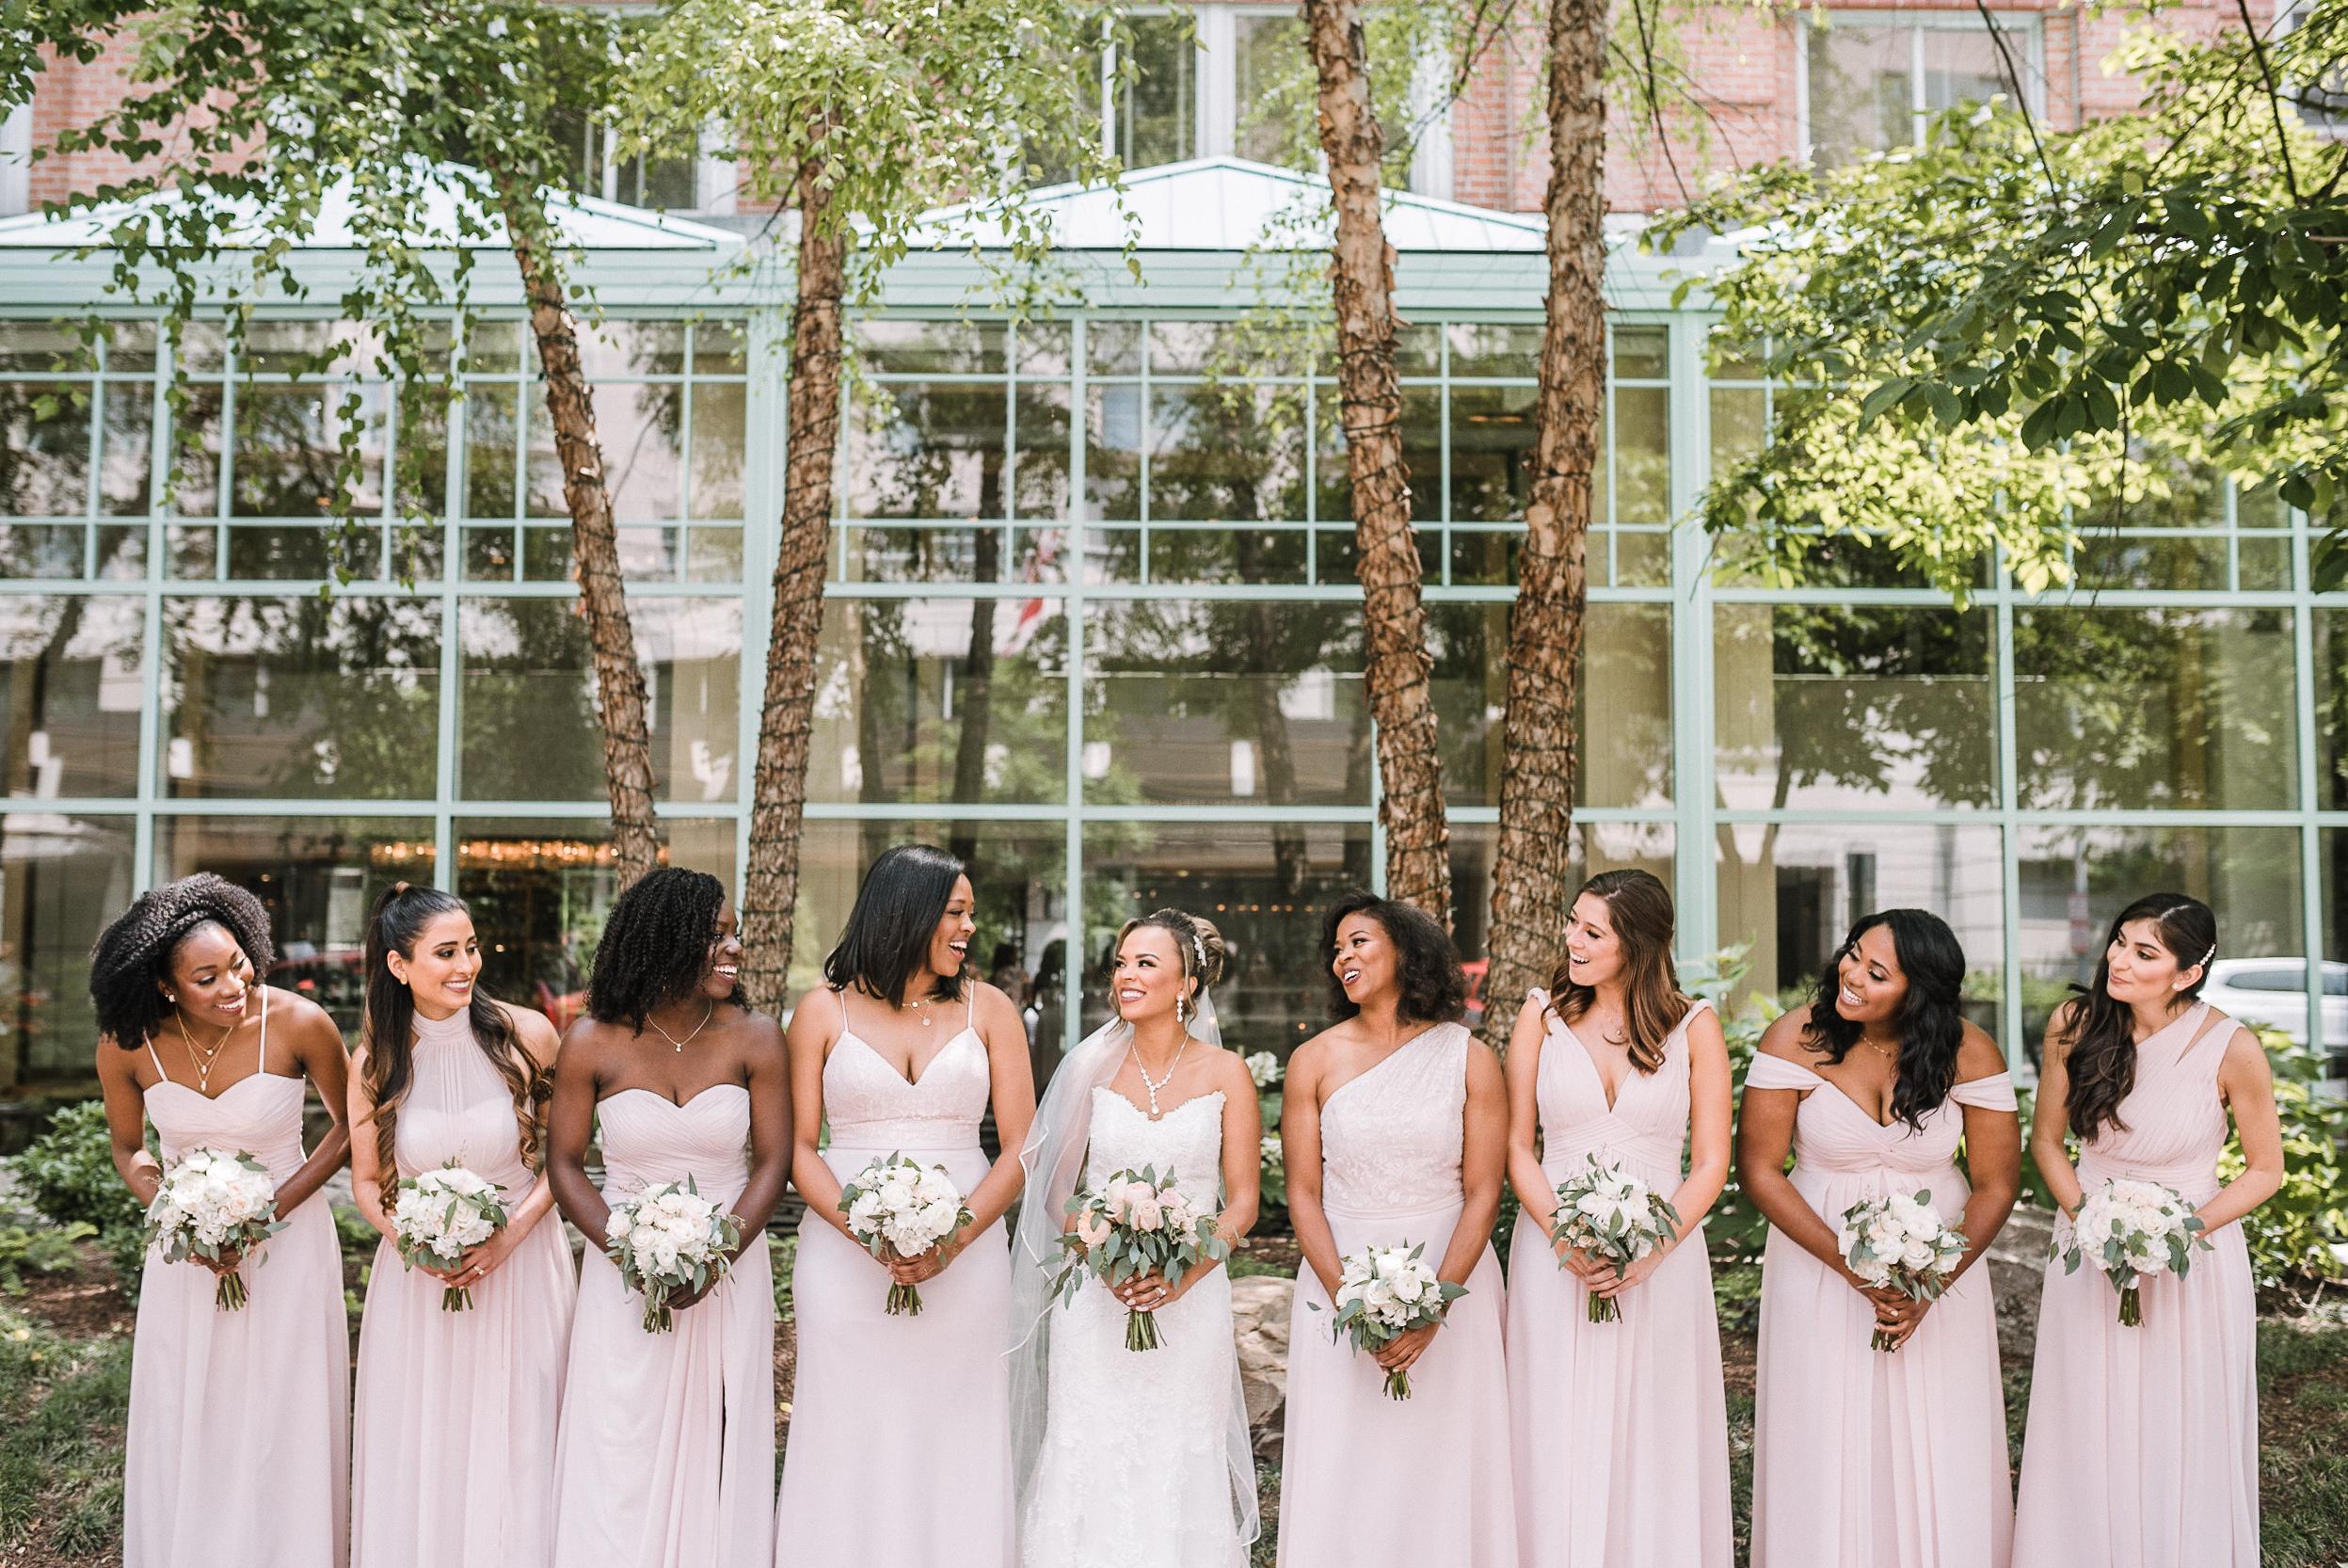 bride and bridesmaids smiling at The Park Hyatt Hotel in Washington DC